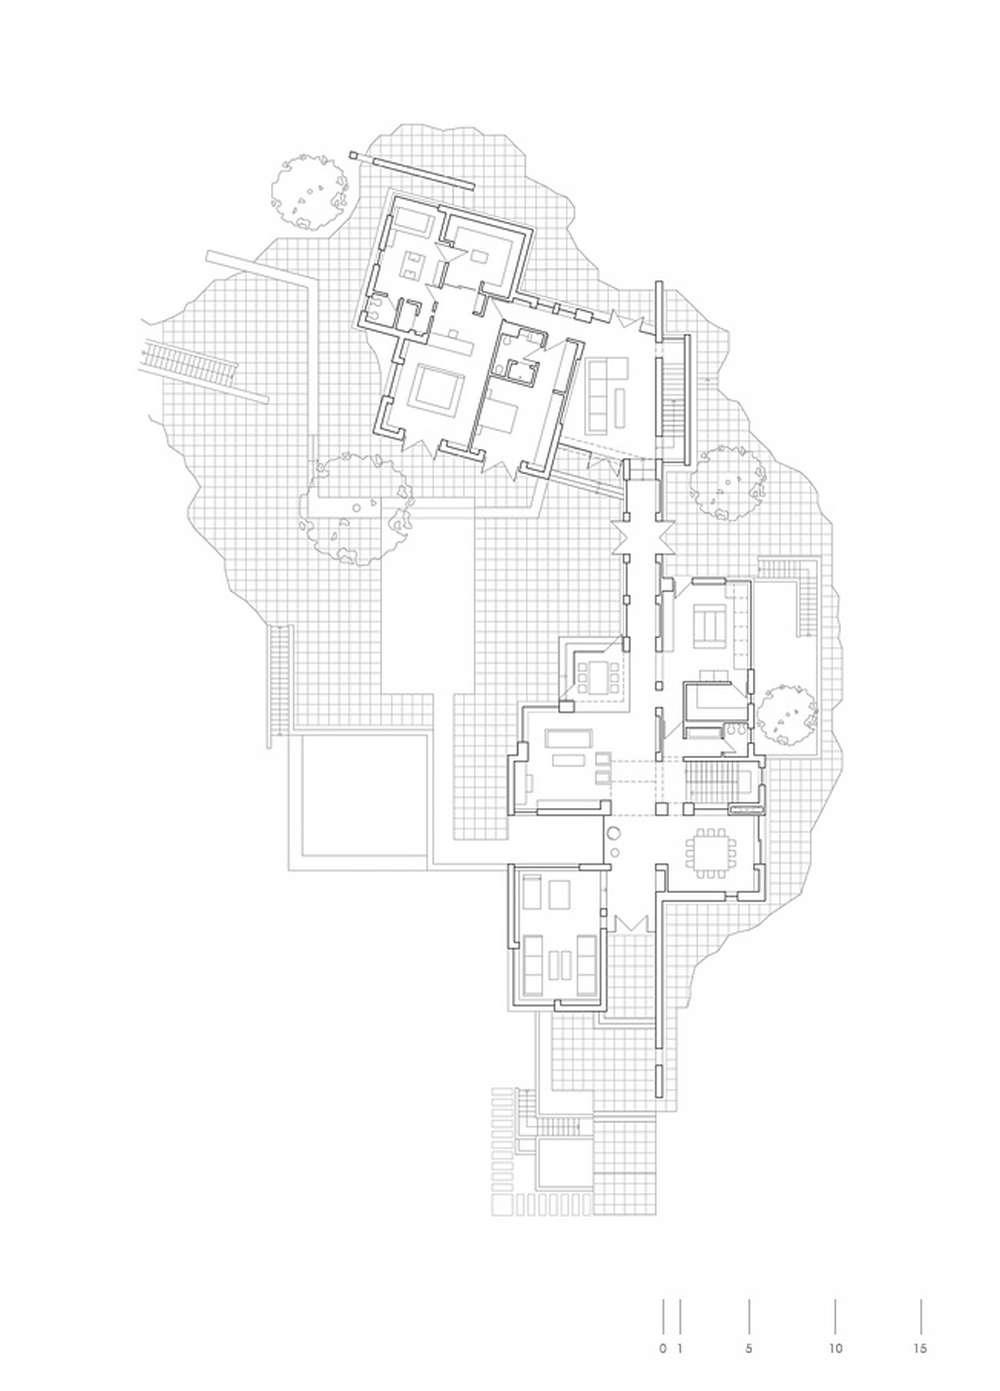 Nice Abu Samra House In Dabuq, Jordan By Symbiosis Designs Ltd